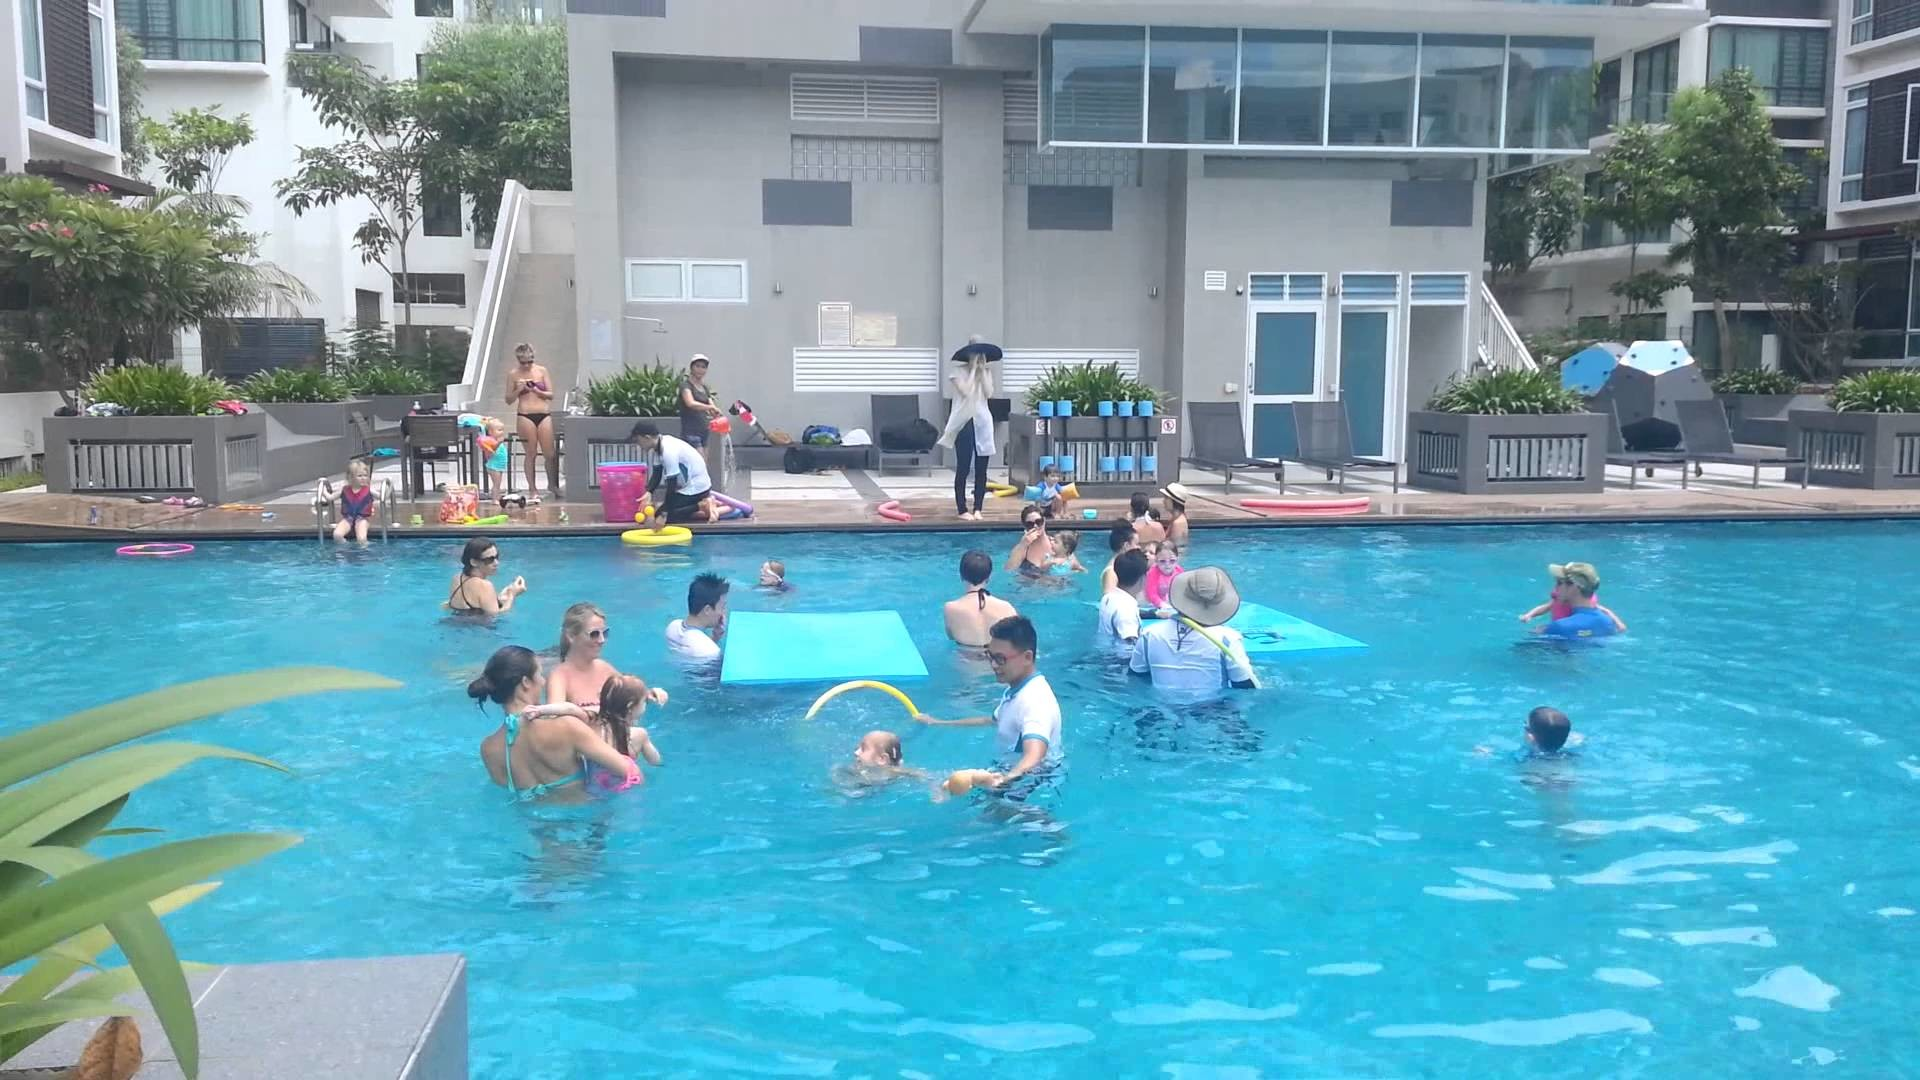 Kids In Swimming Pool Wallpaper 64 Images